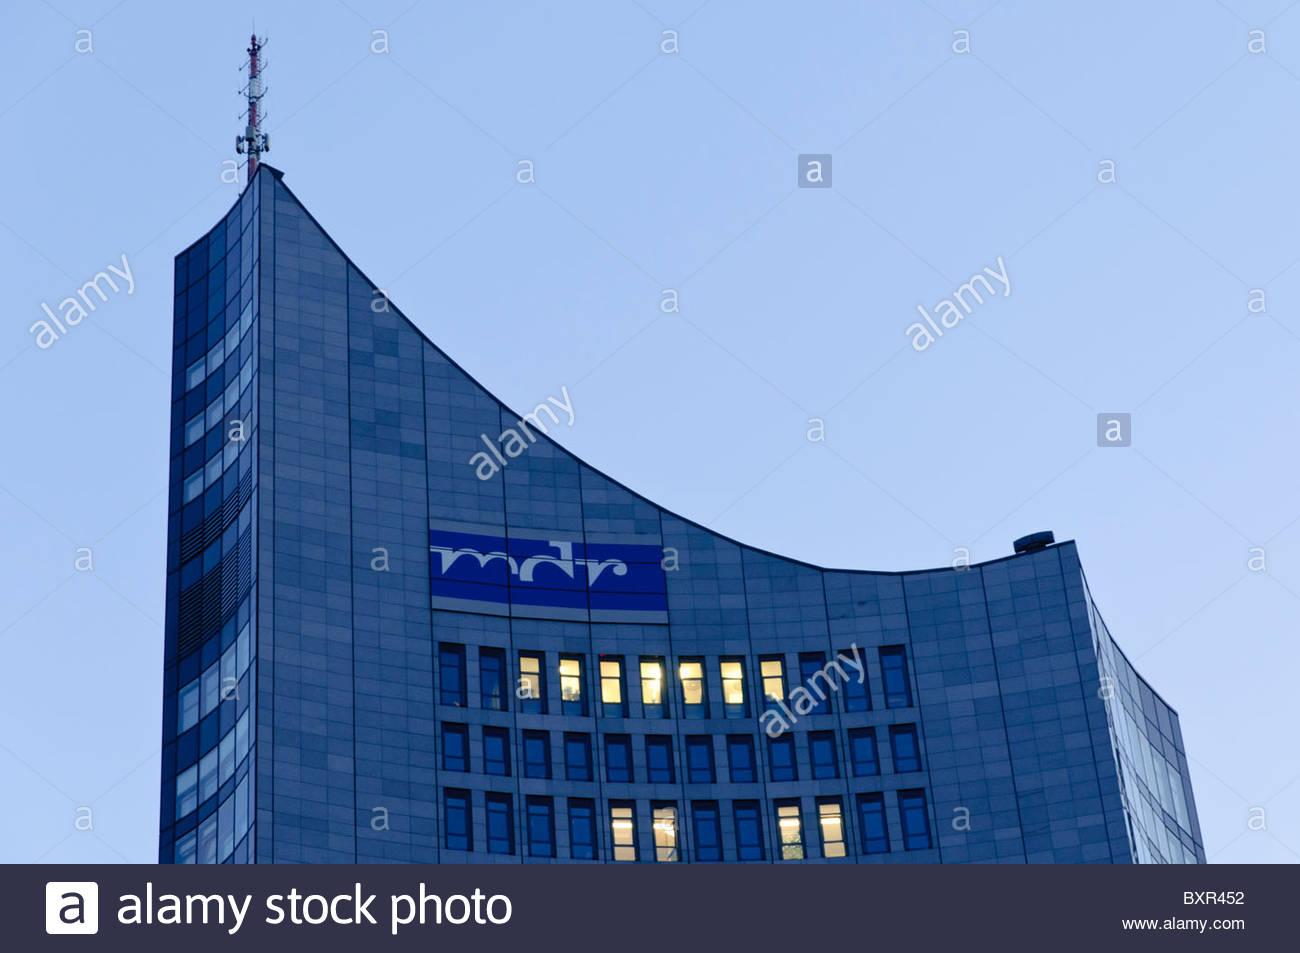 City-Hochhaus skyscraper, Panorama Tower, MDR, Leipzig, Saxony, Germany, Europe - Stock Image